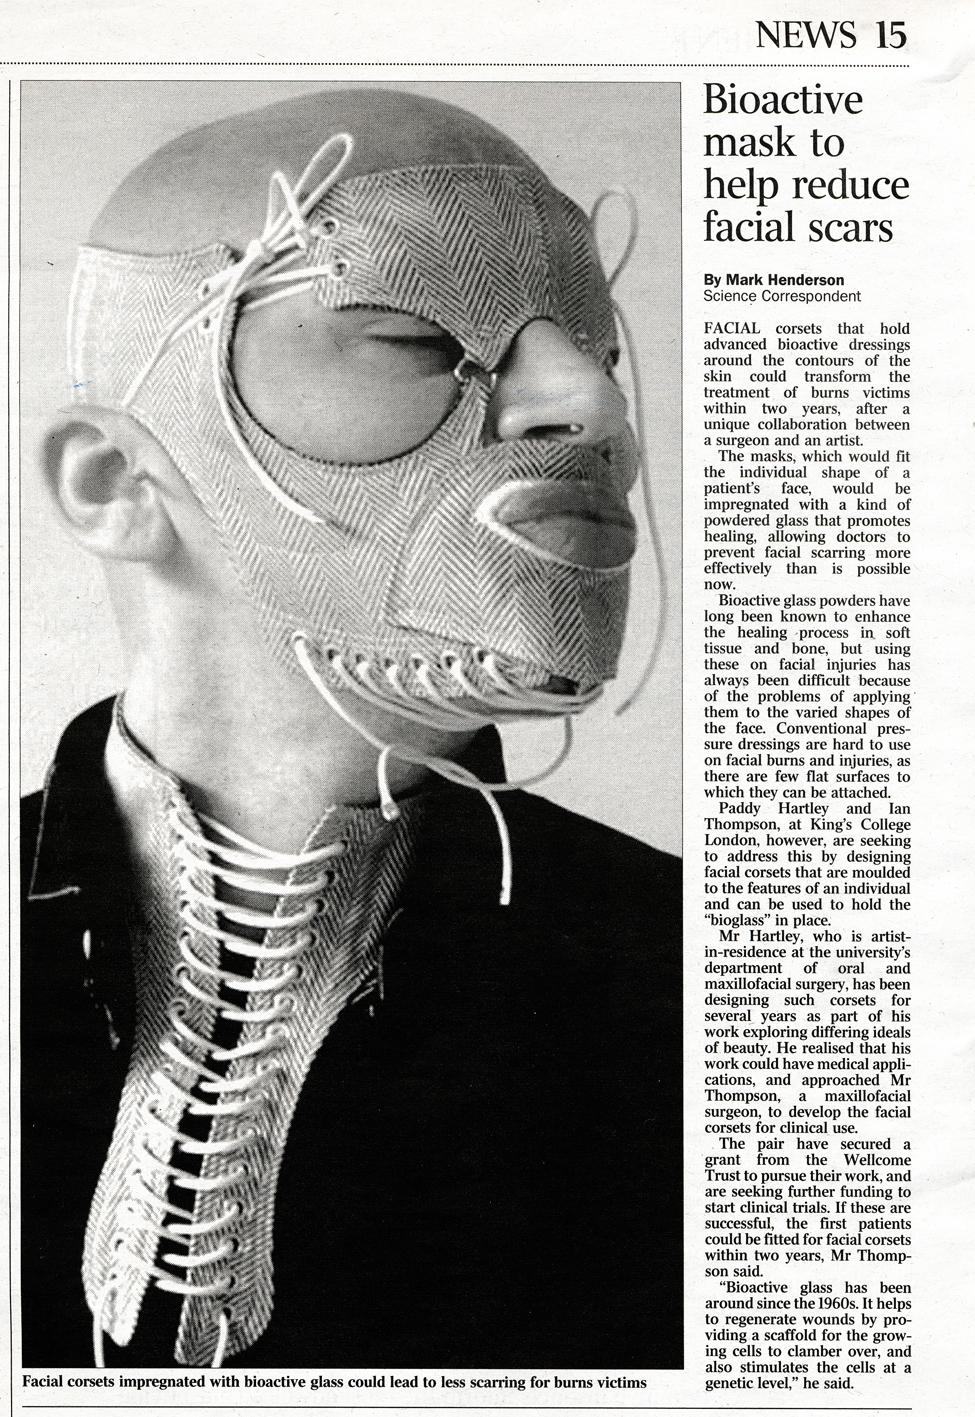 2. The Times.jpg